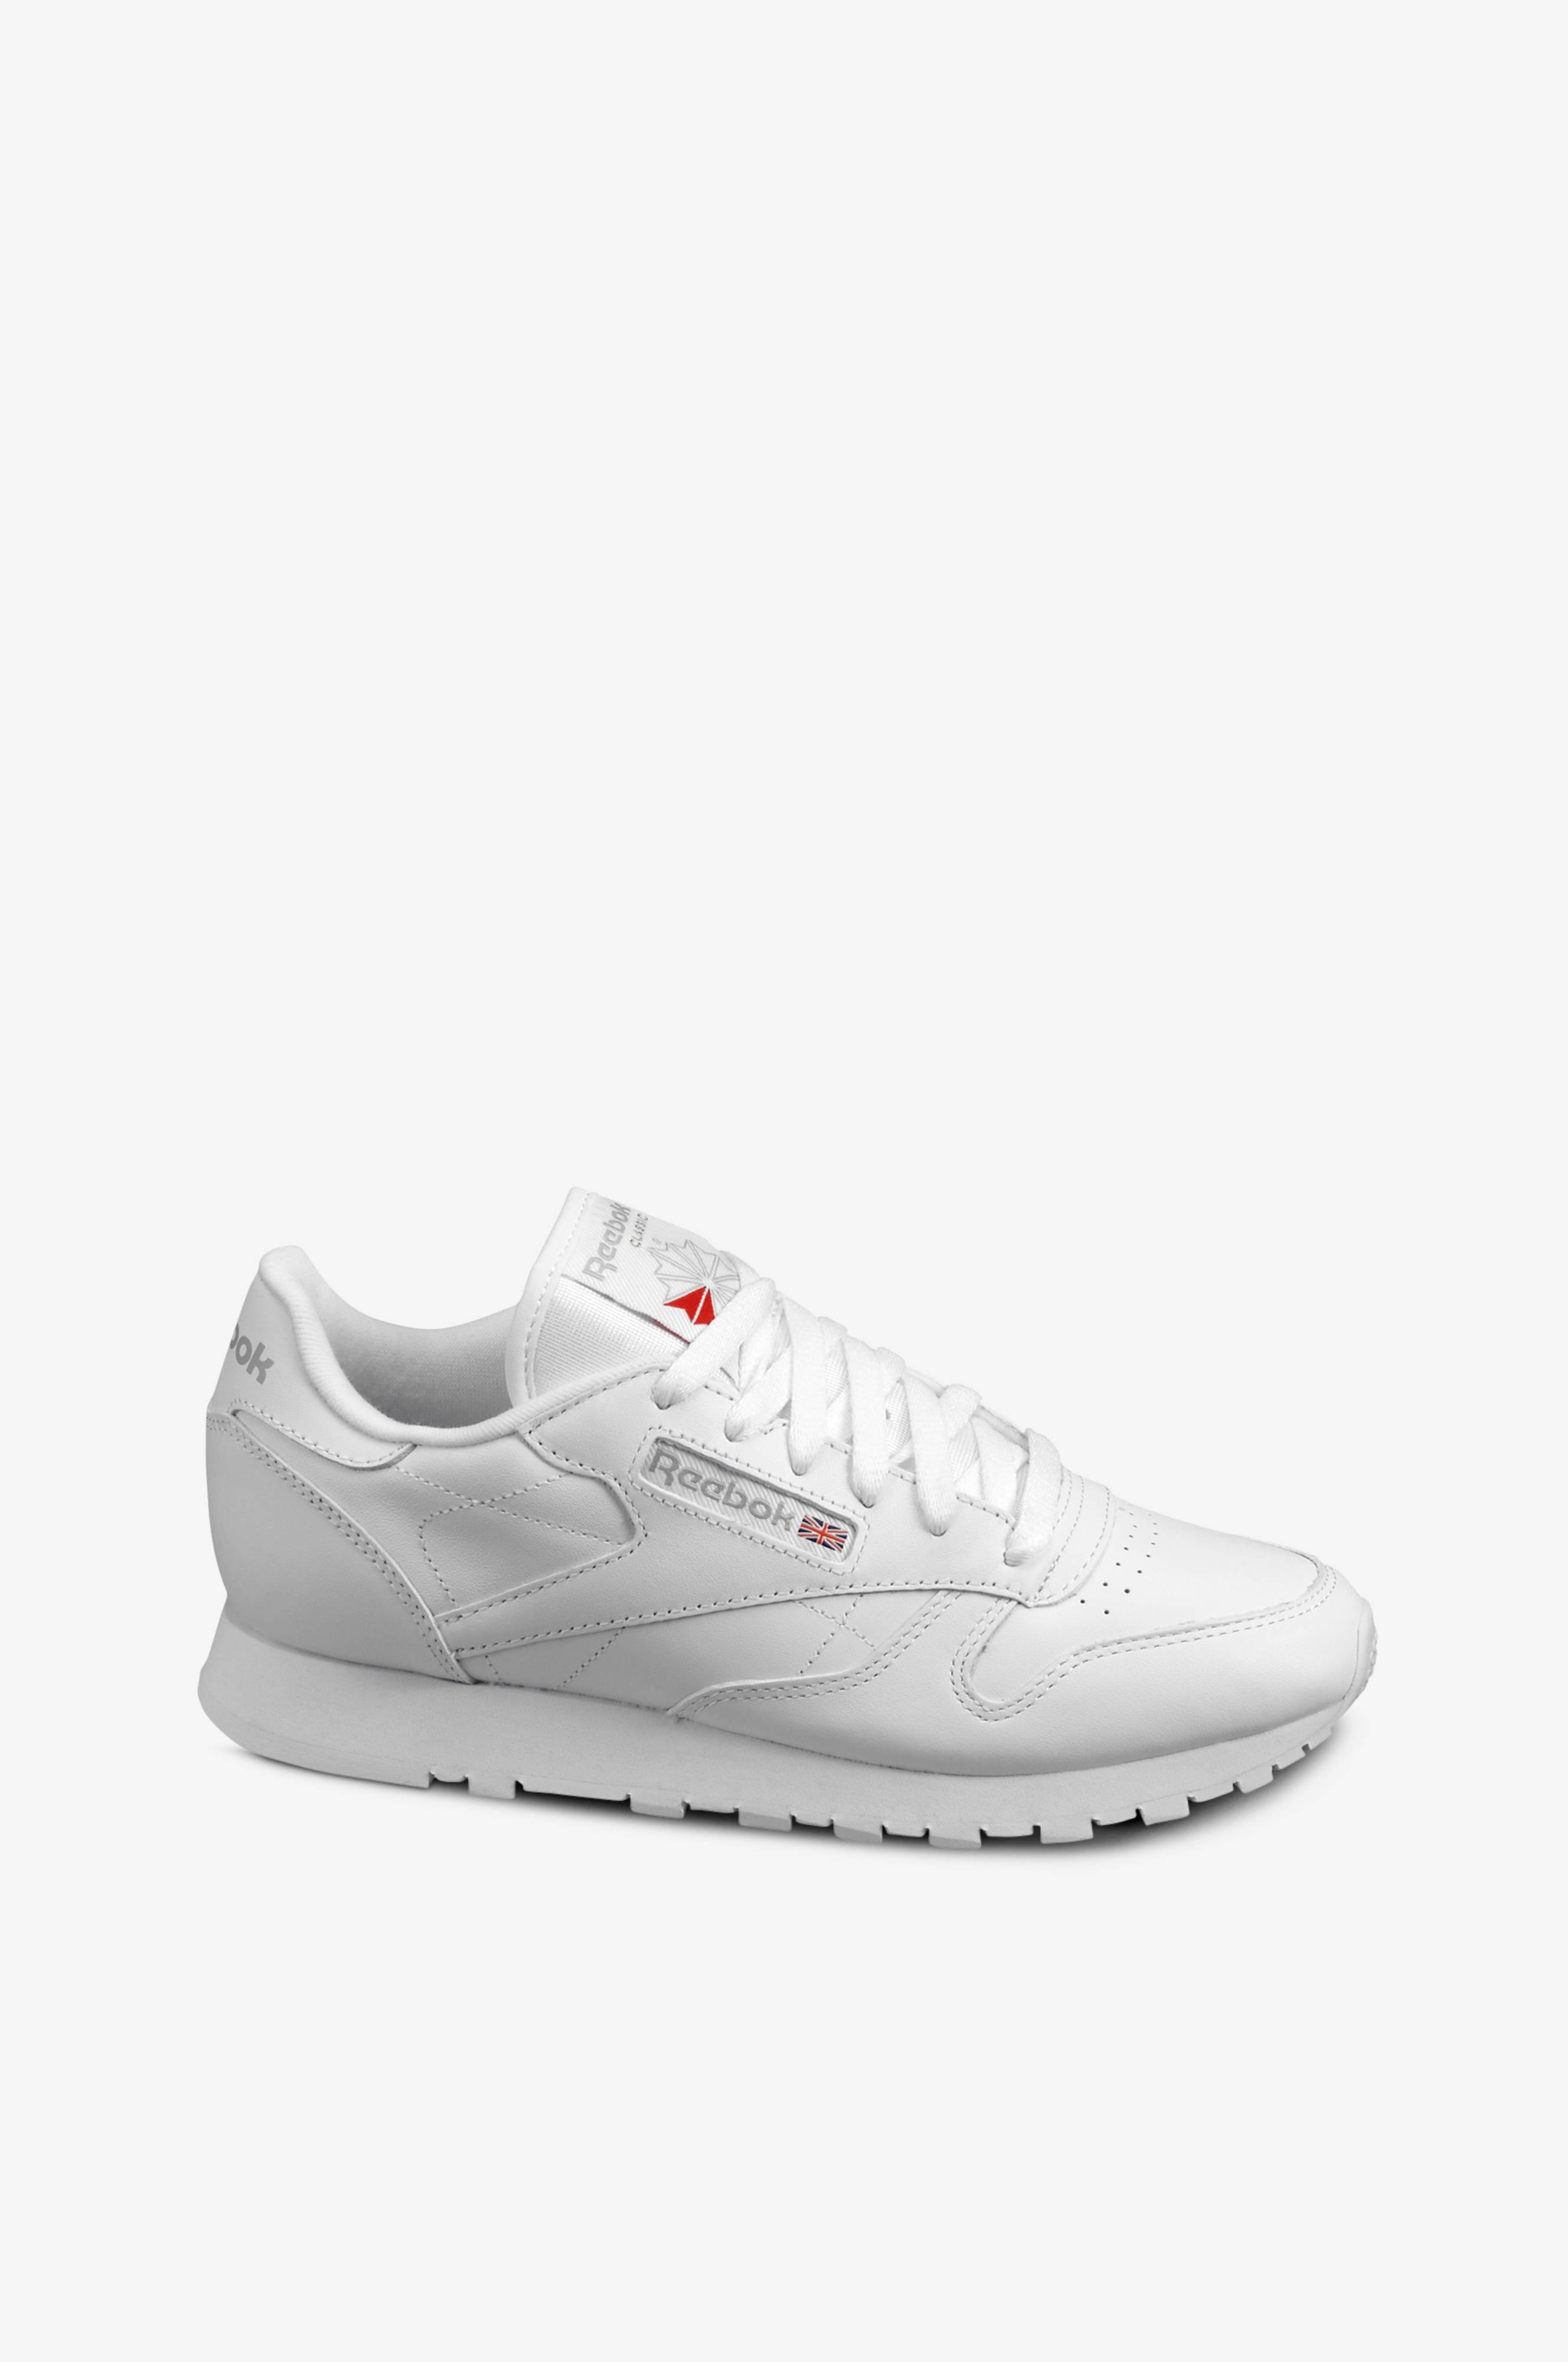 Hvit av no Reebok LTHR skinn CL Dame Sneakers Classic Ellos IxqqCw1gY